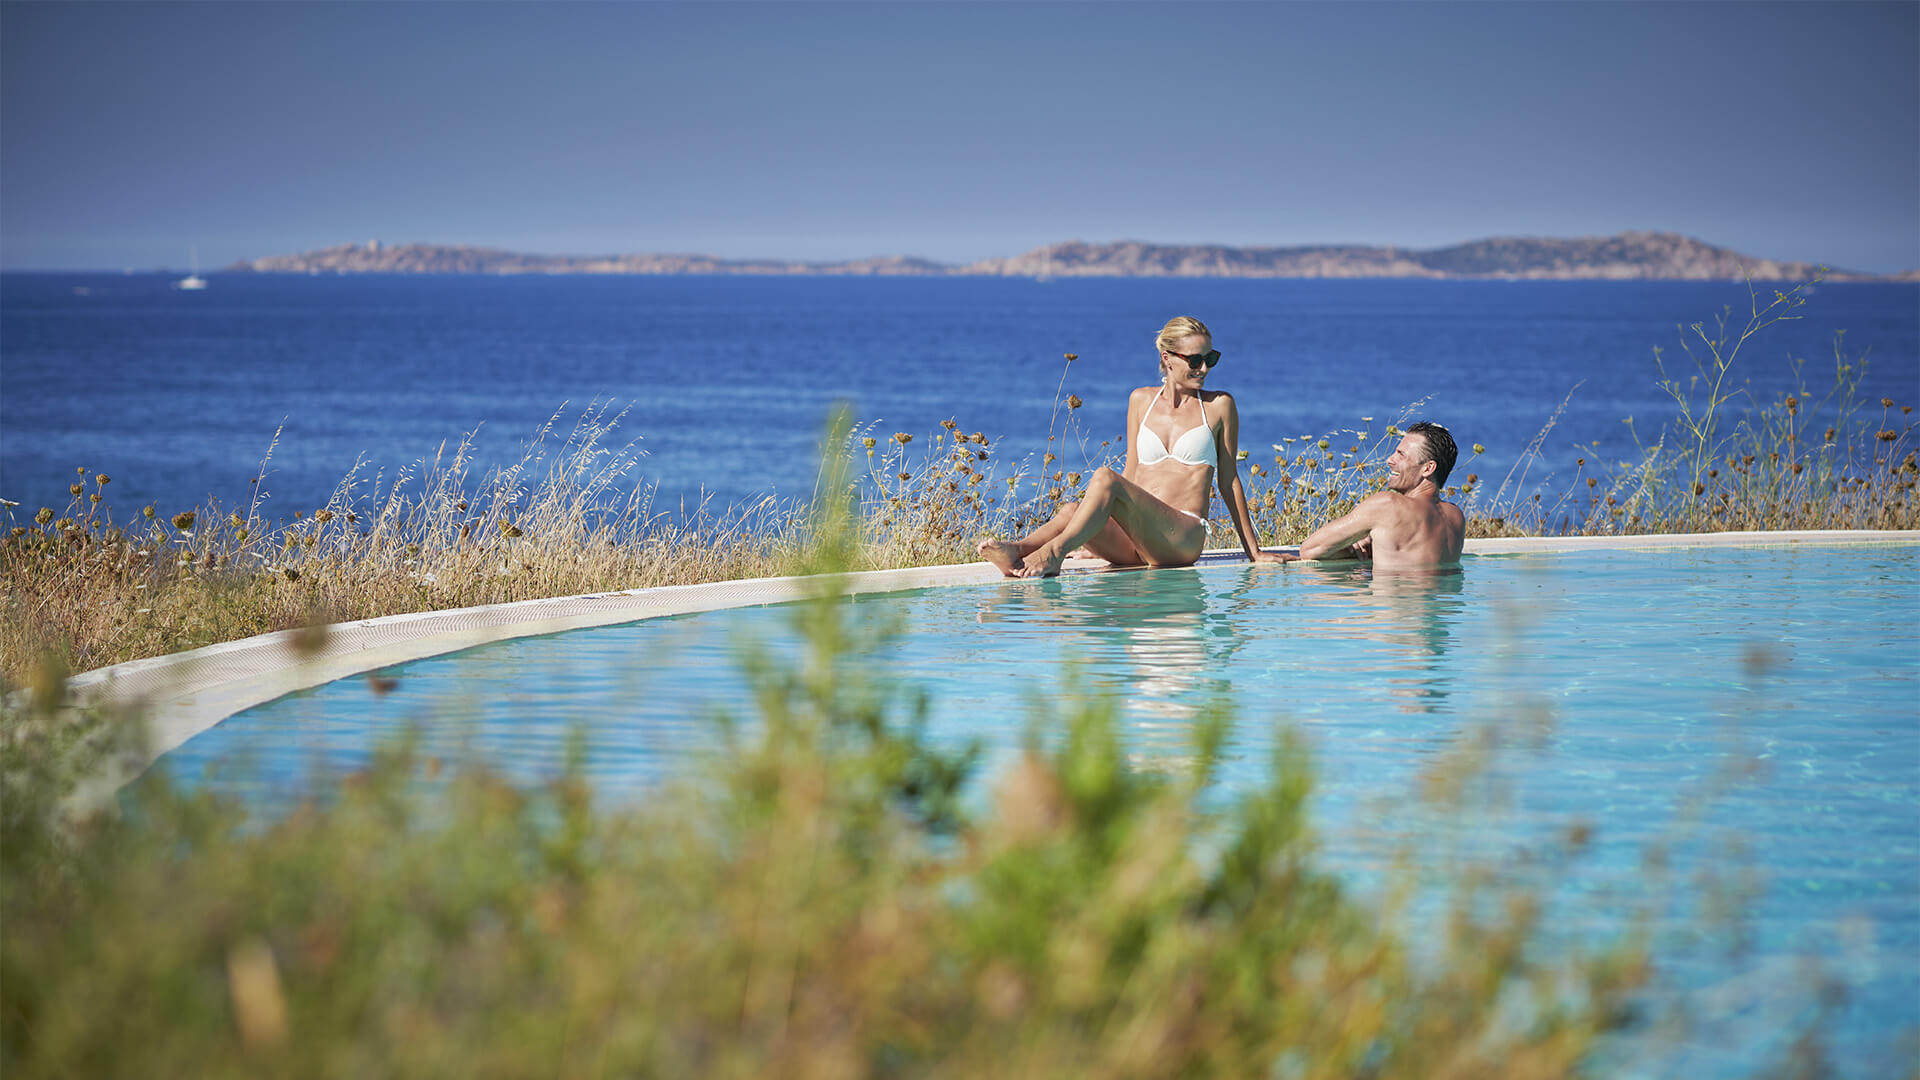 resort-valle-erica-talasso-piscina-premi-2020-01